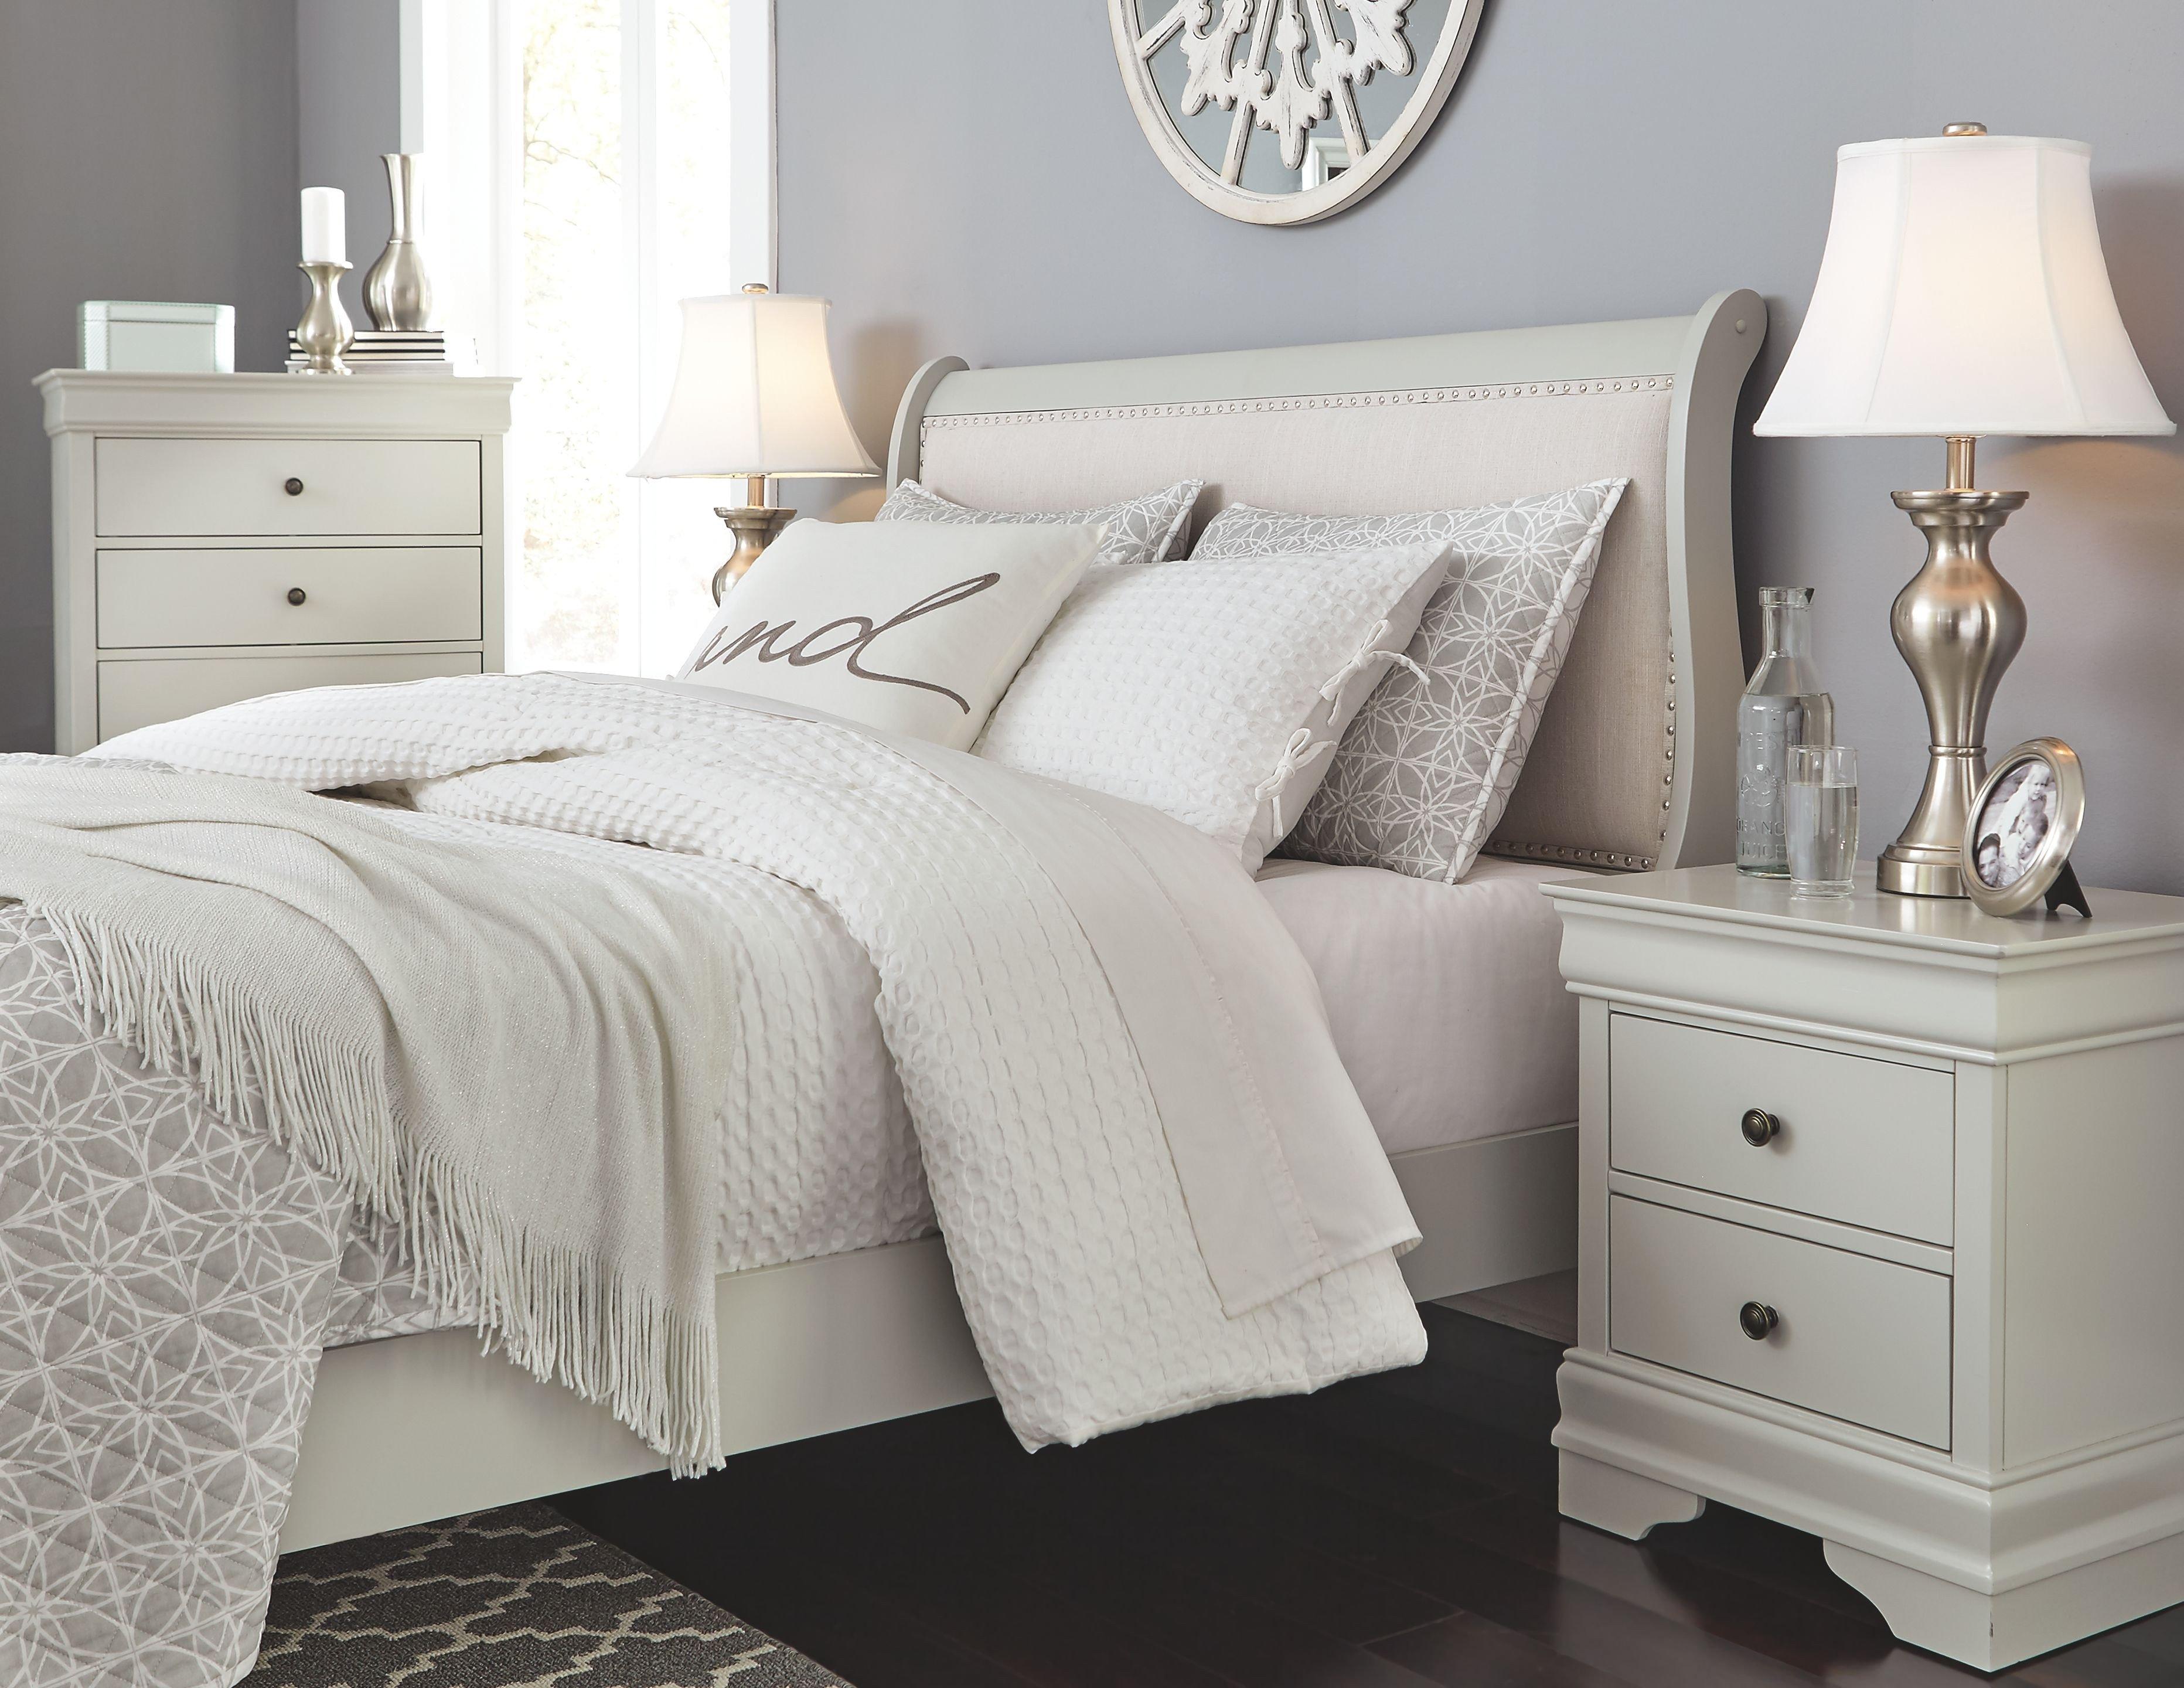 White King Size Bedroom Set Elegant Jorstad Full Bed with 2 Nightstands Gray